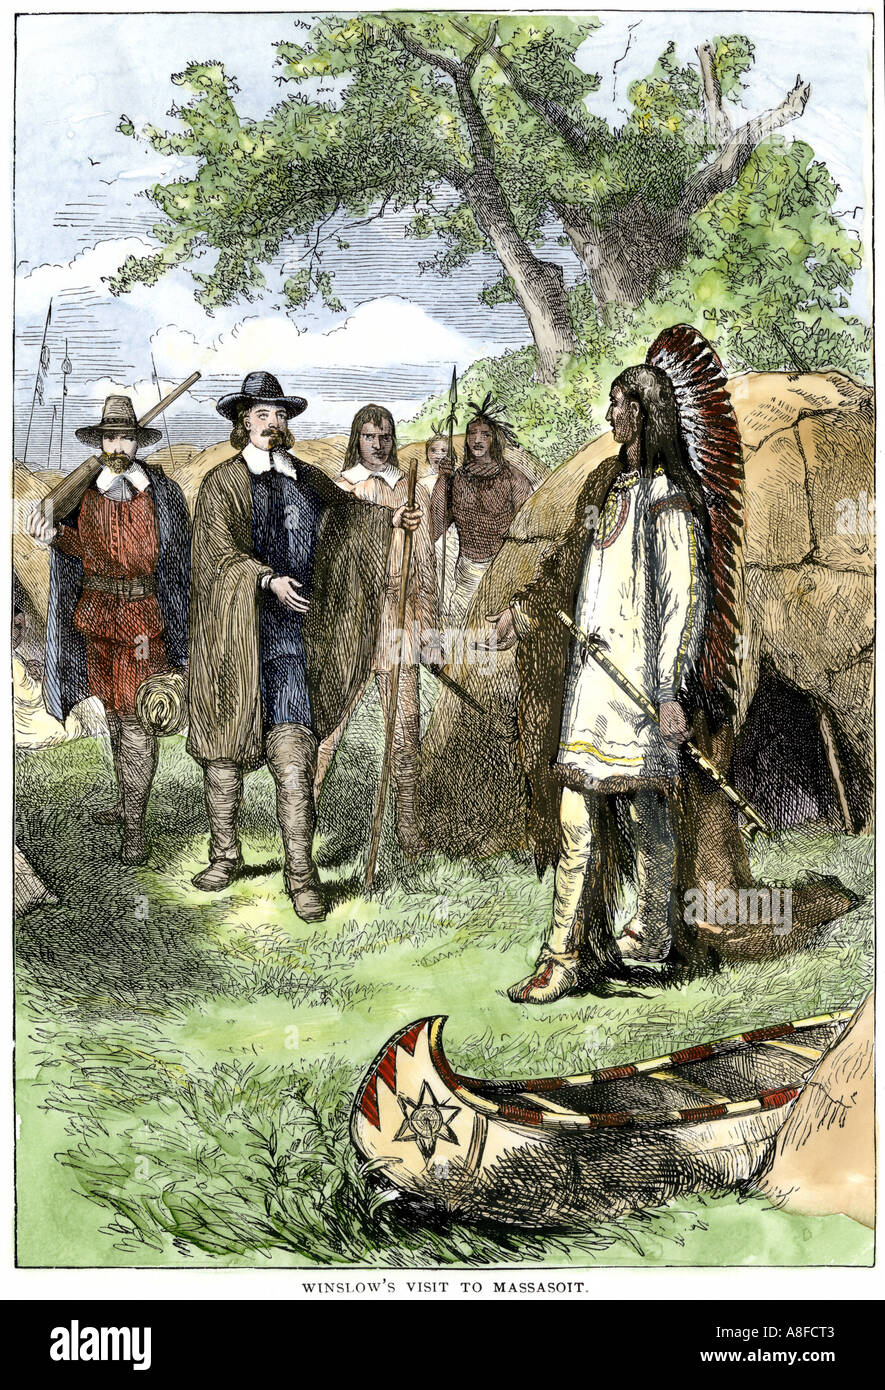 Native American Clothing Island